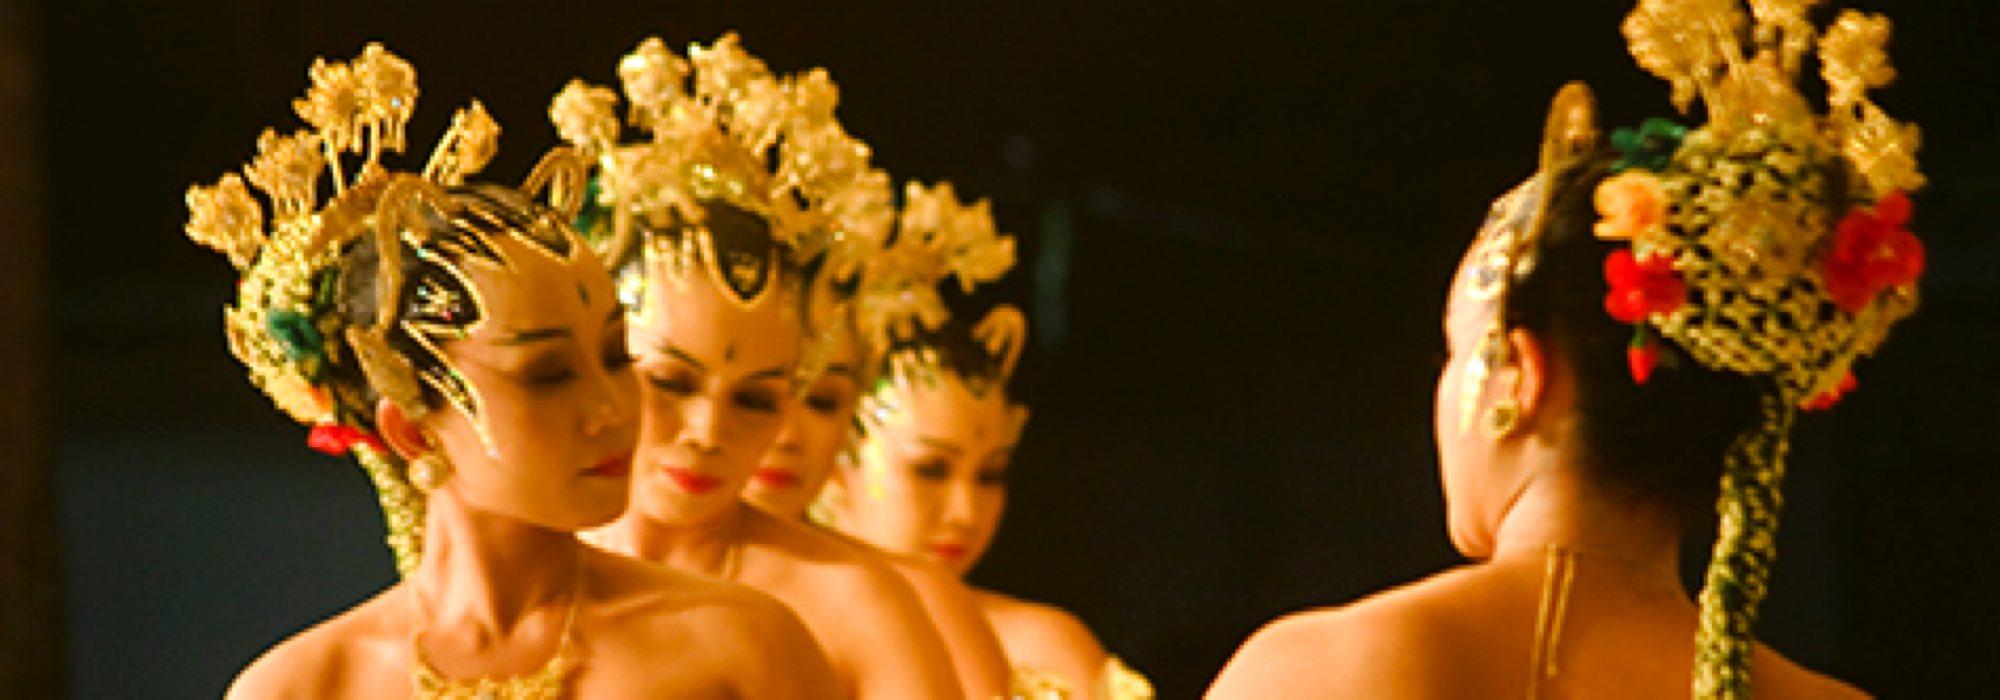 Dancers wearing gold headdresses.